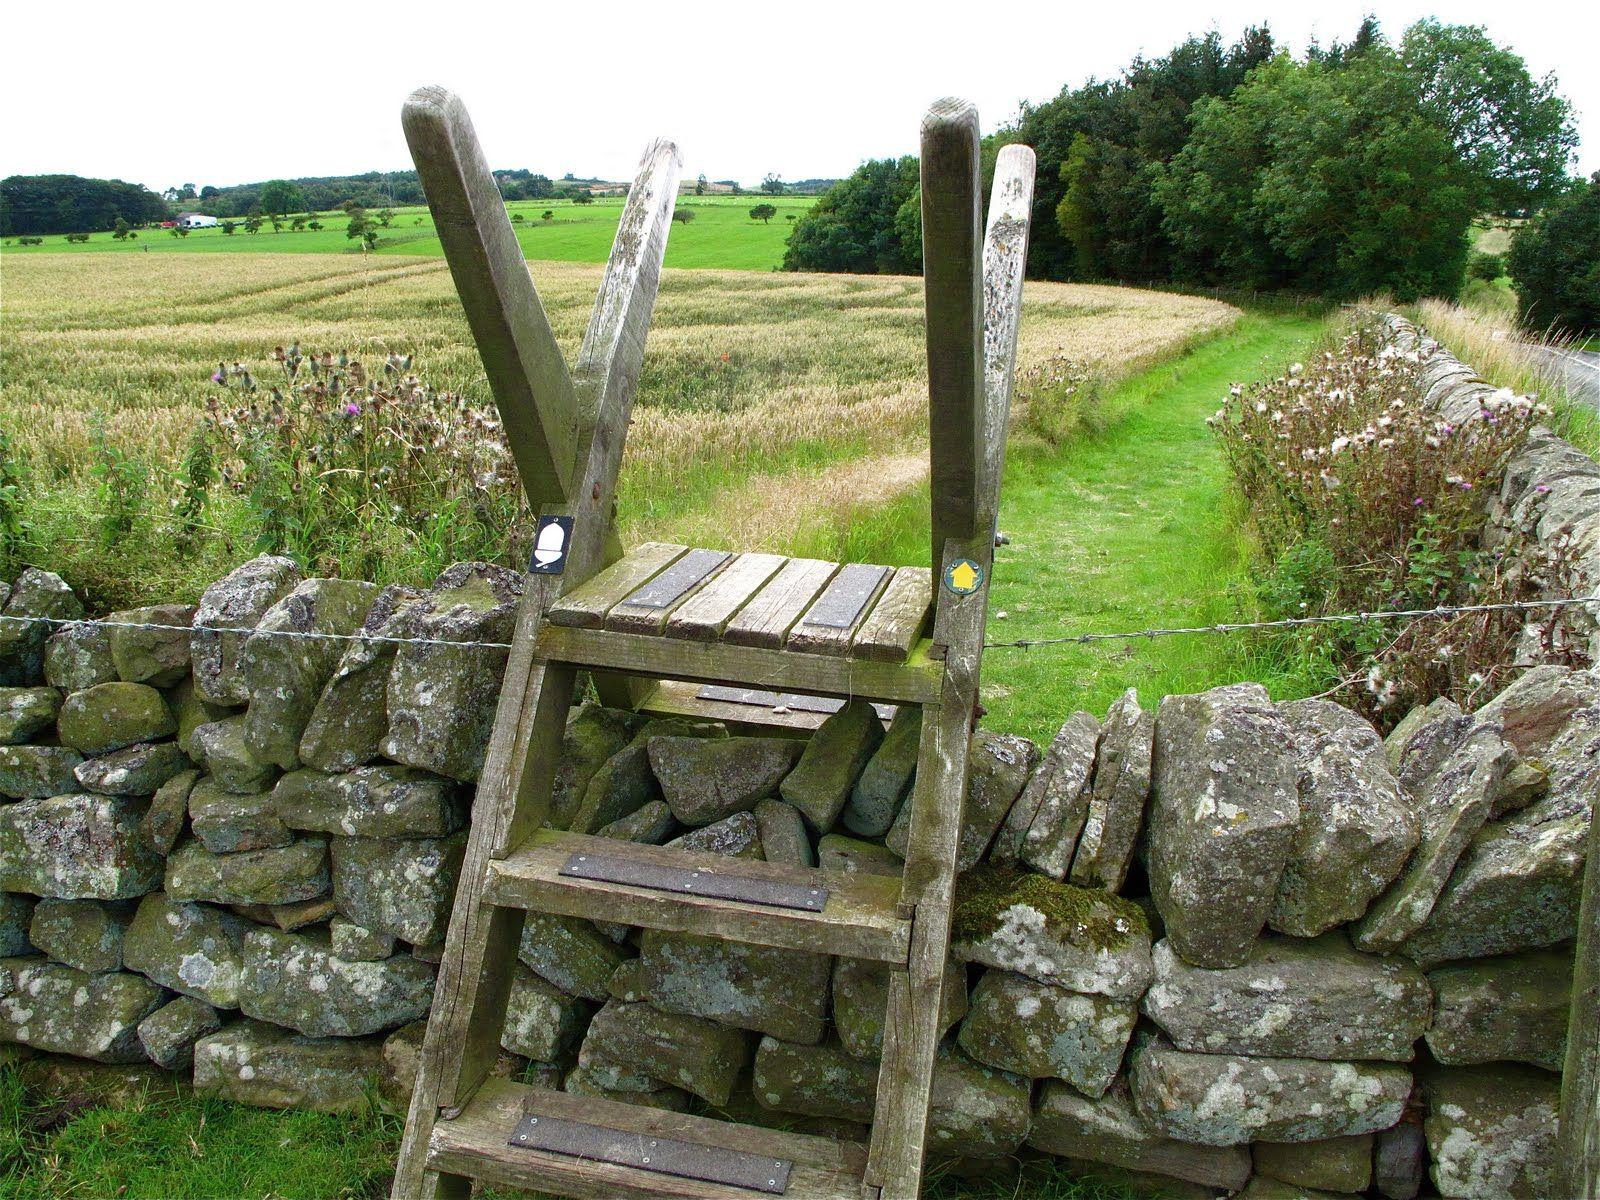 fence stile | Country Stiles, Gates, and Fences | Pinterest | Fences ...